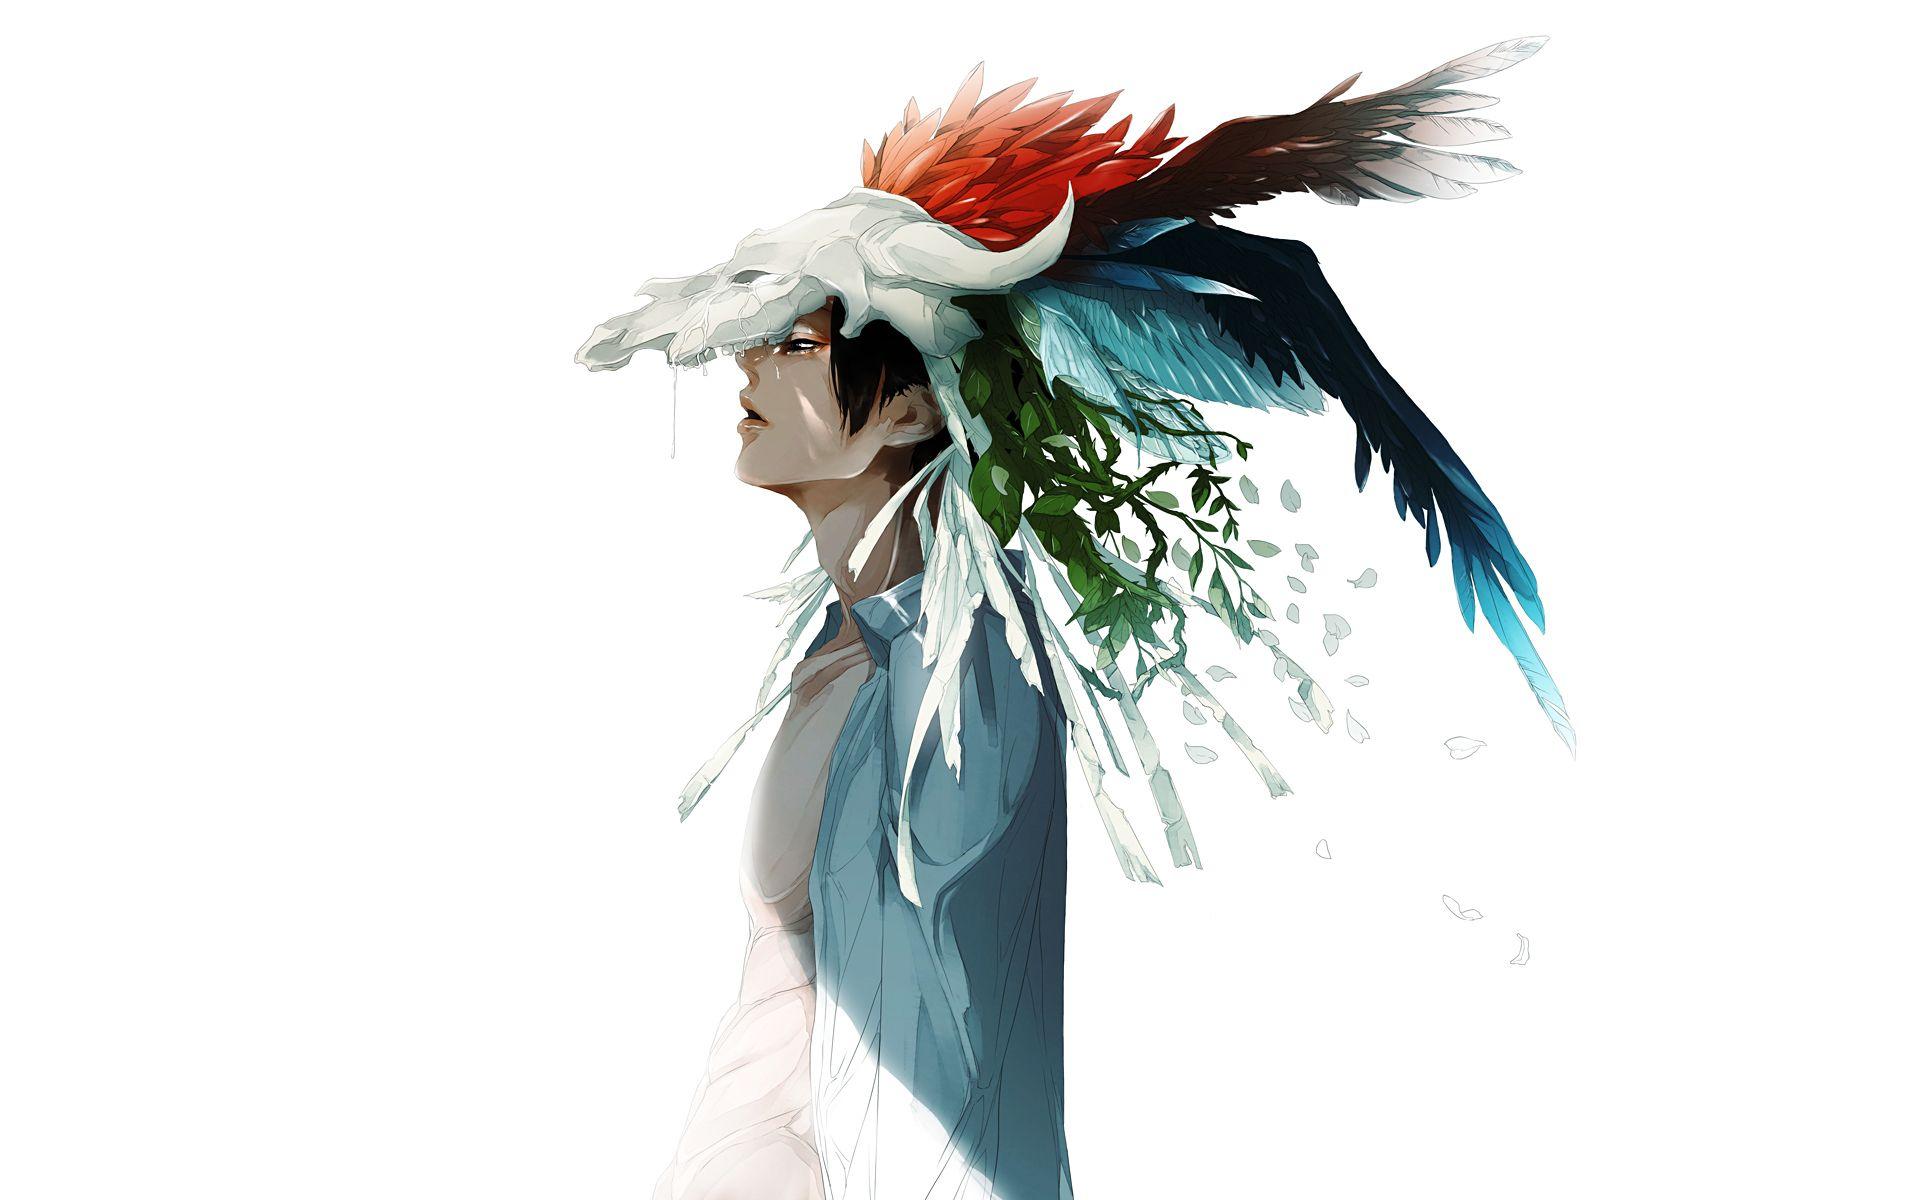 animeboycoolfeathersadnessartwatercolorwallpaper